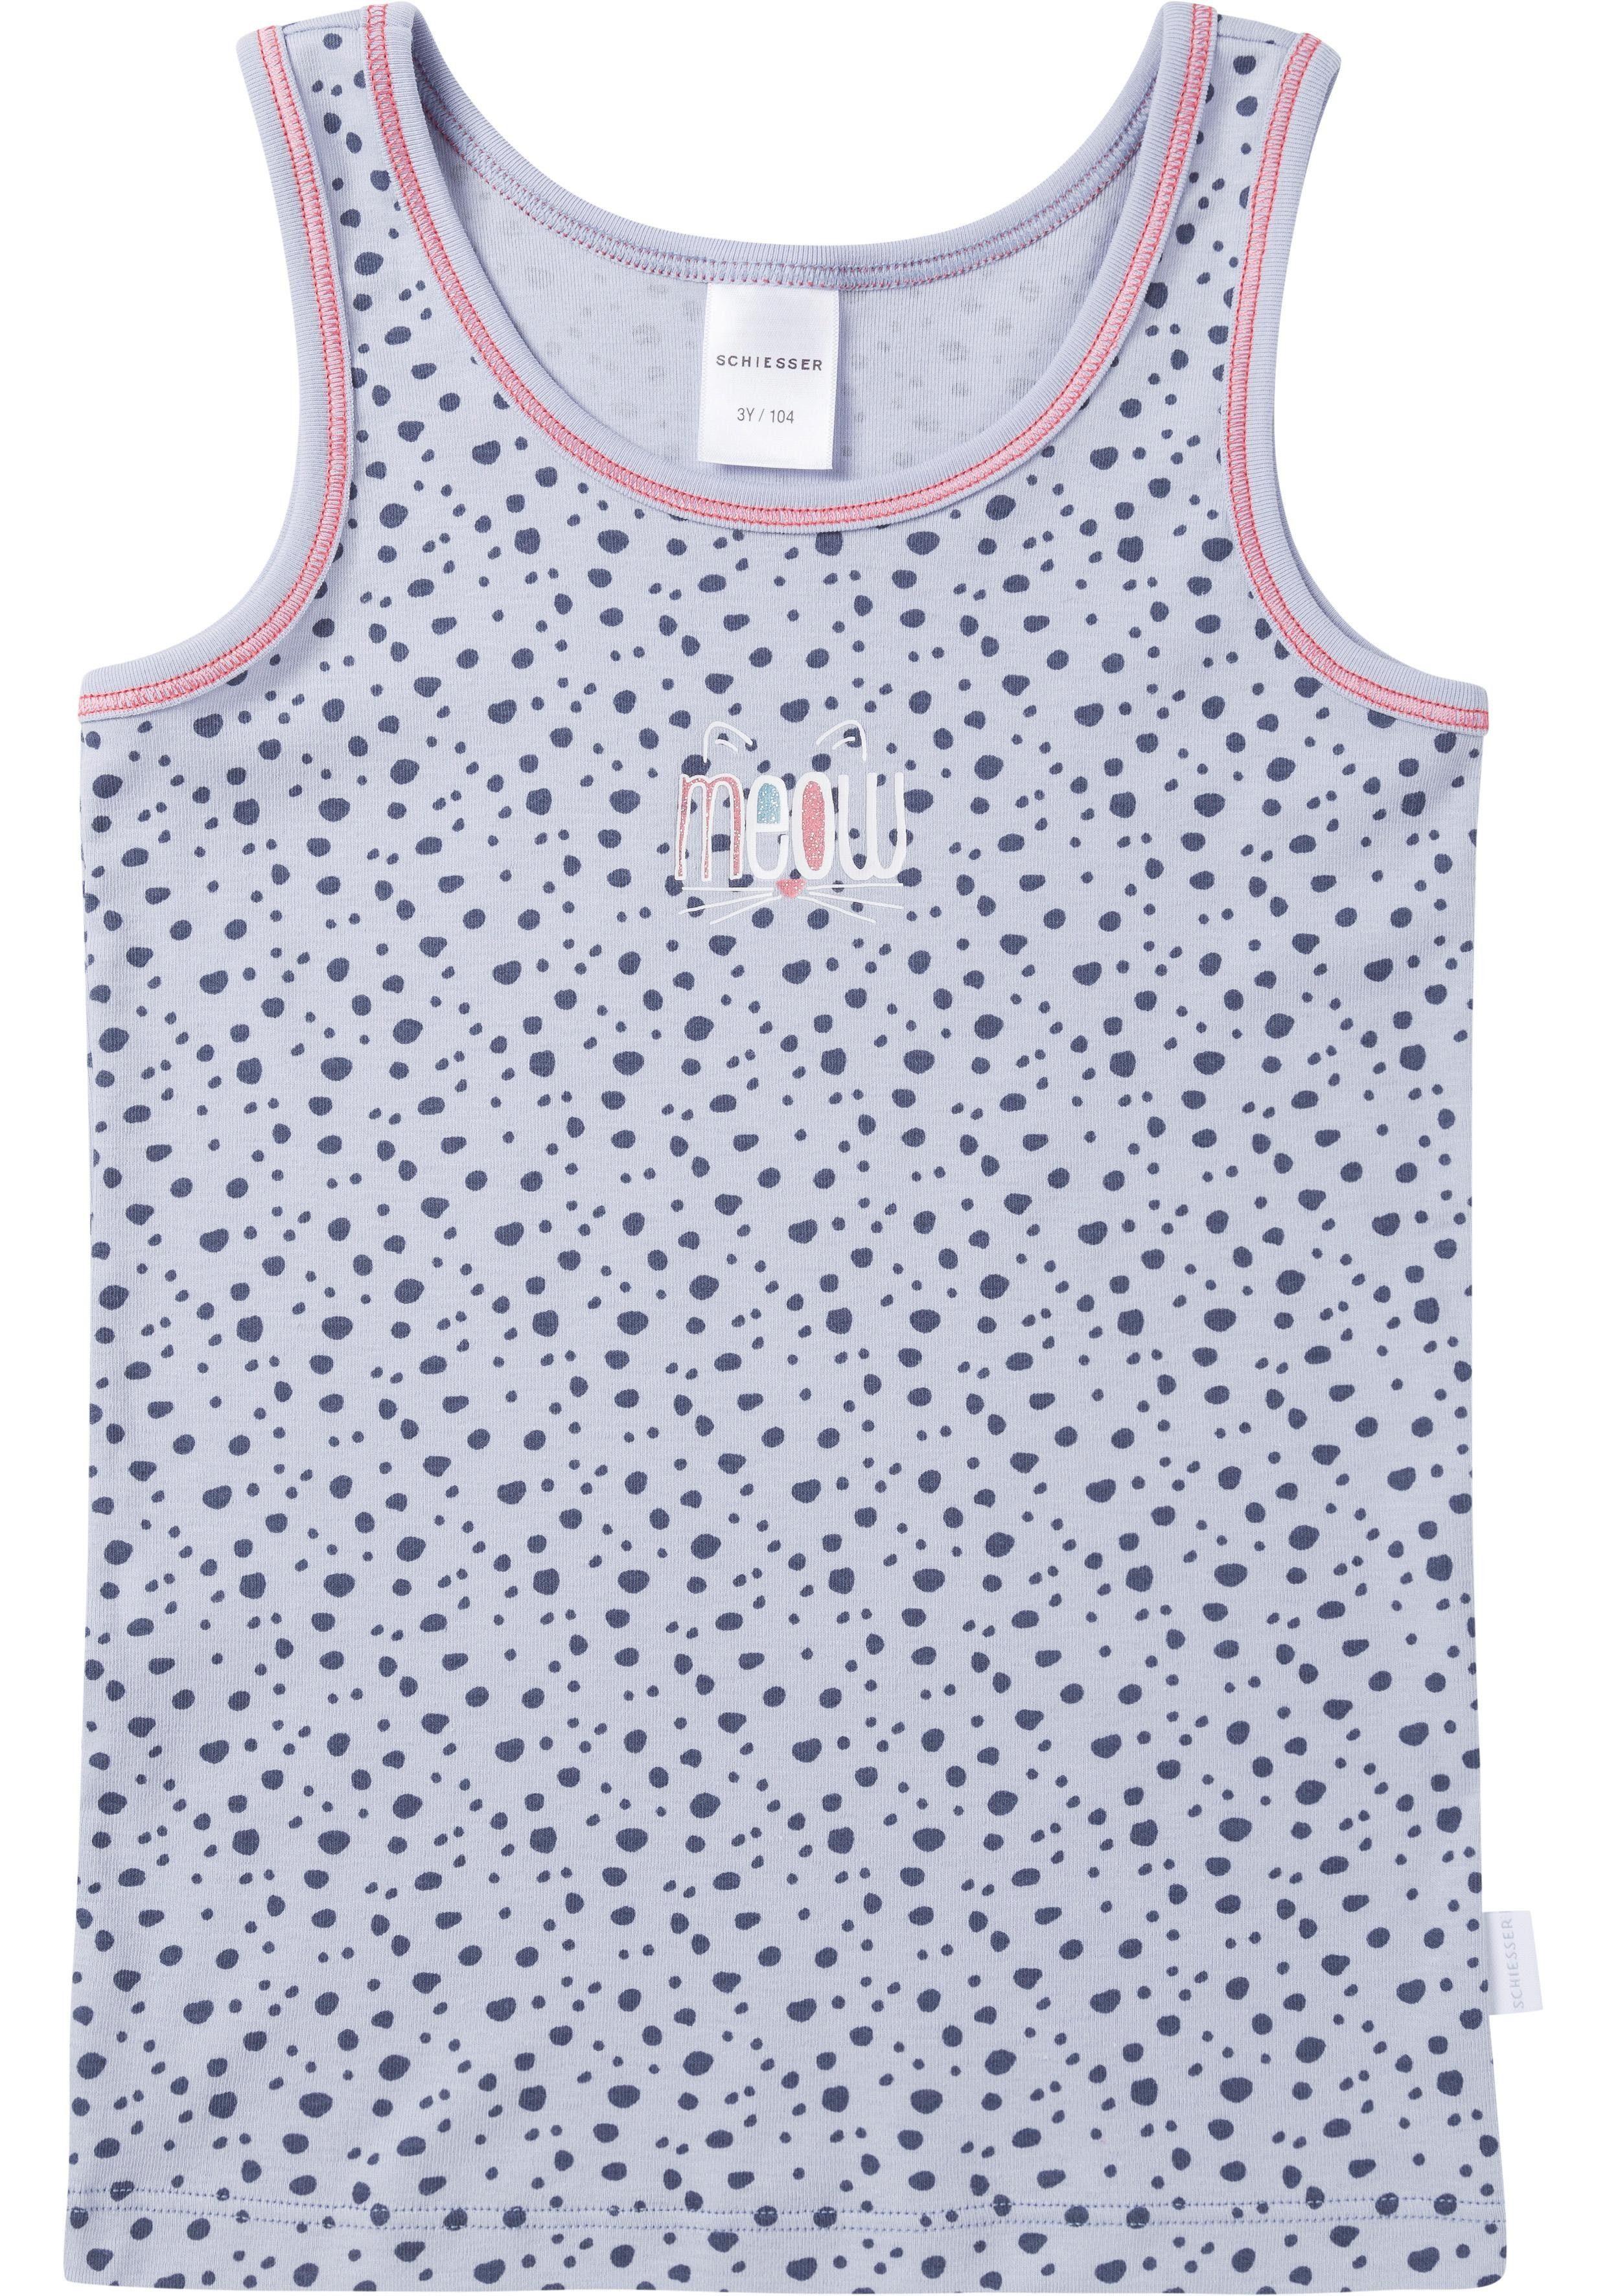 Mädchen Cat Zoe Hemd 00 Unterhemd